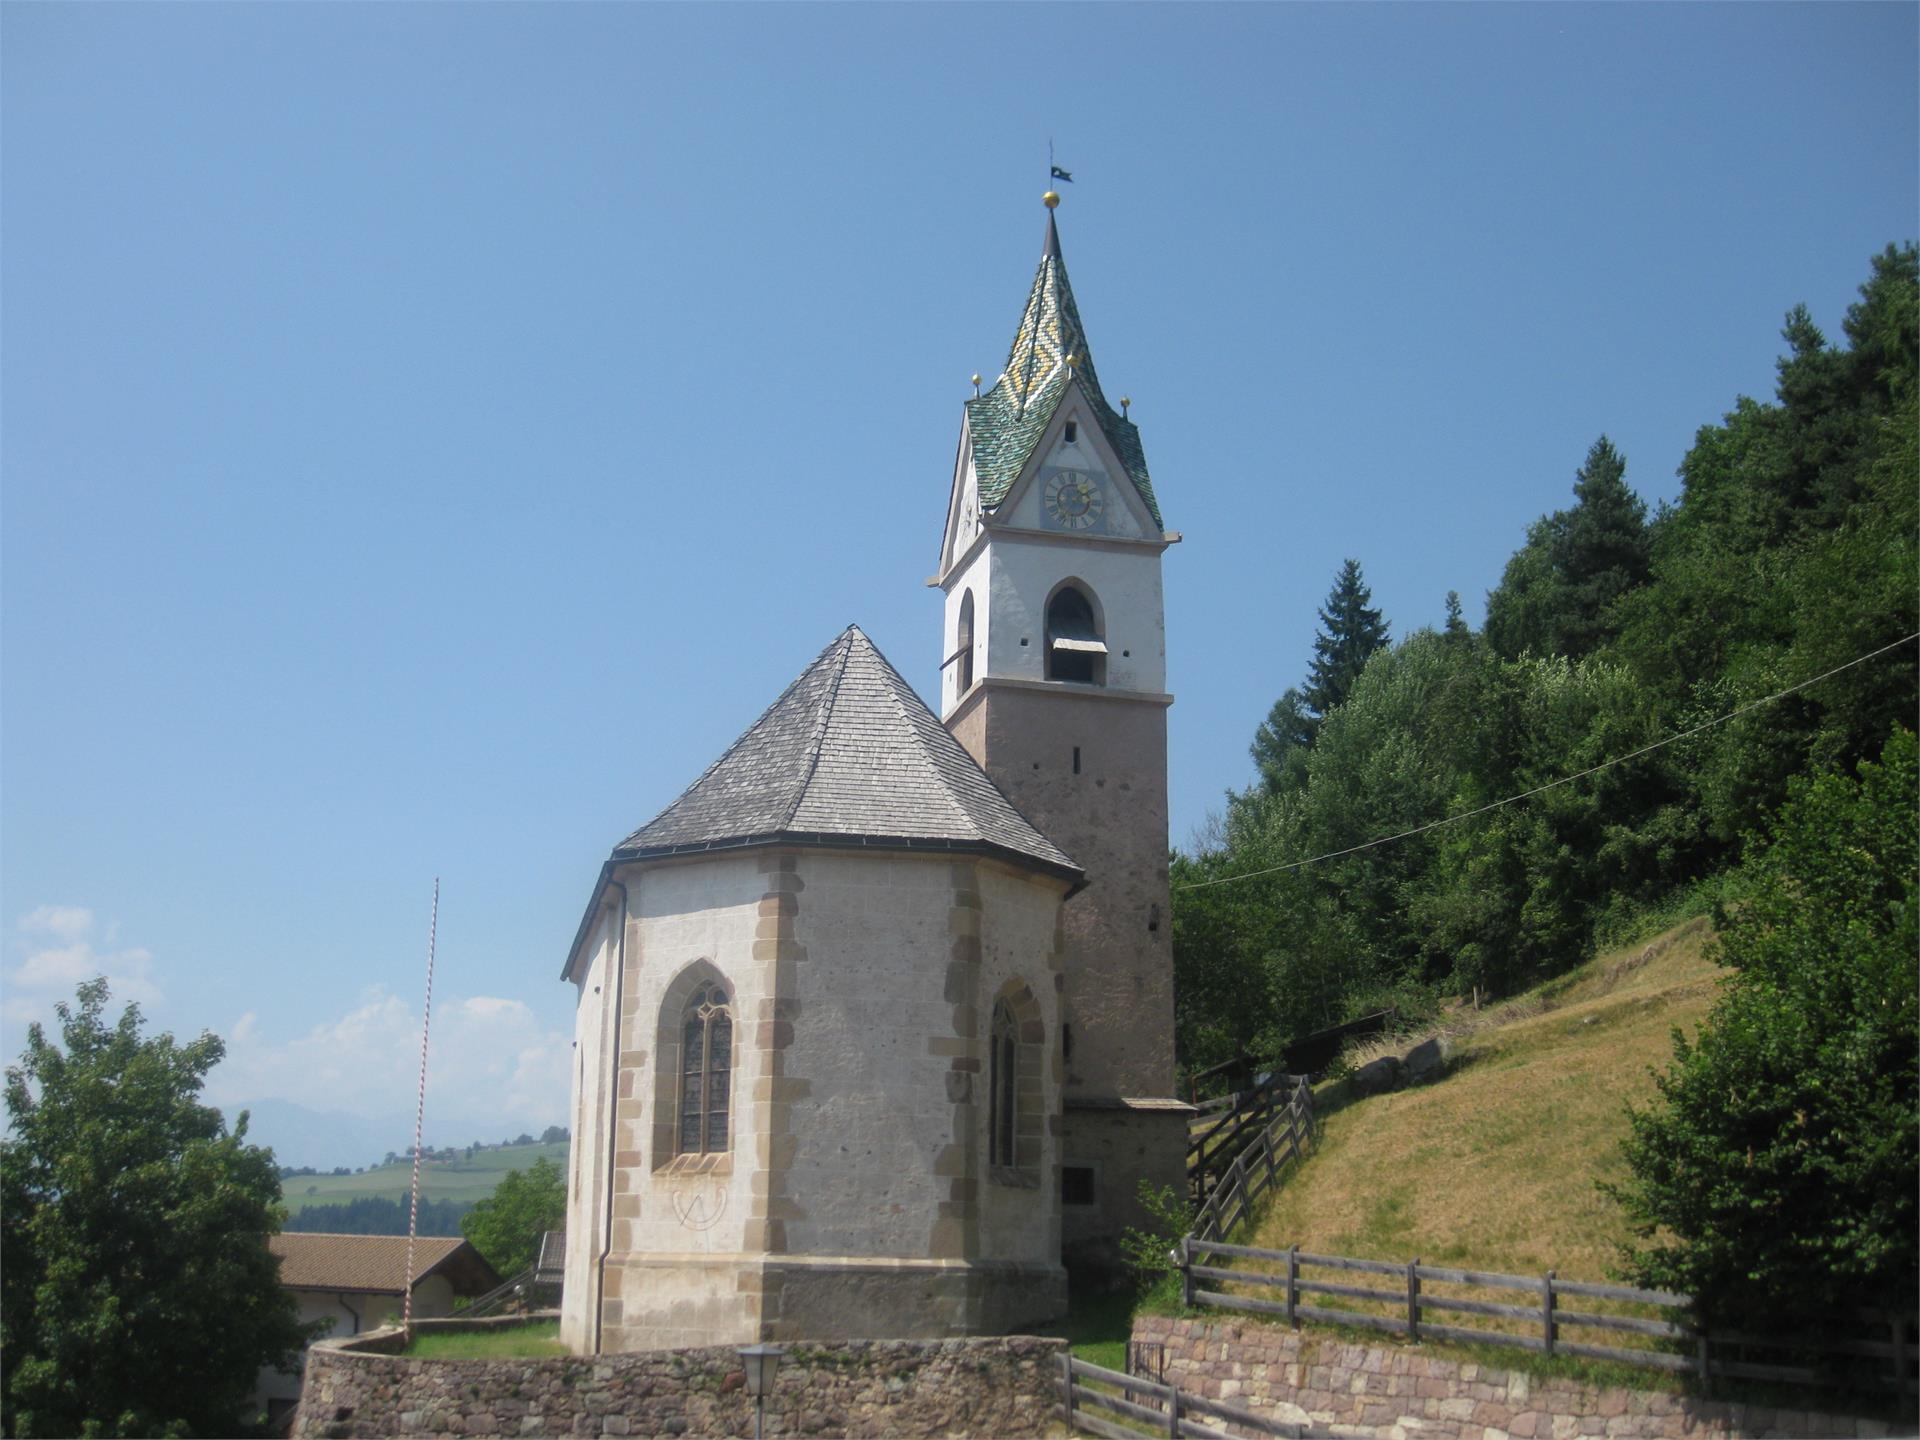 Chiesa S. Blasio a Frassineto